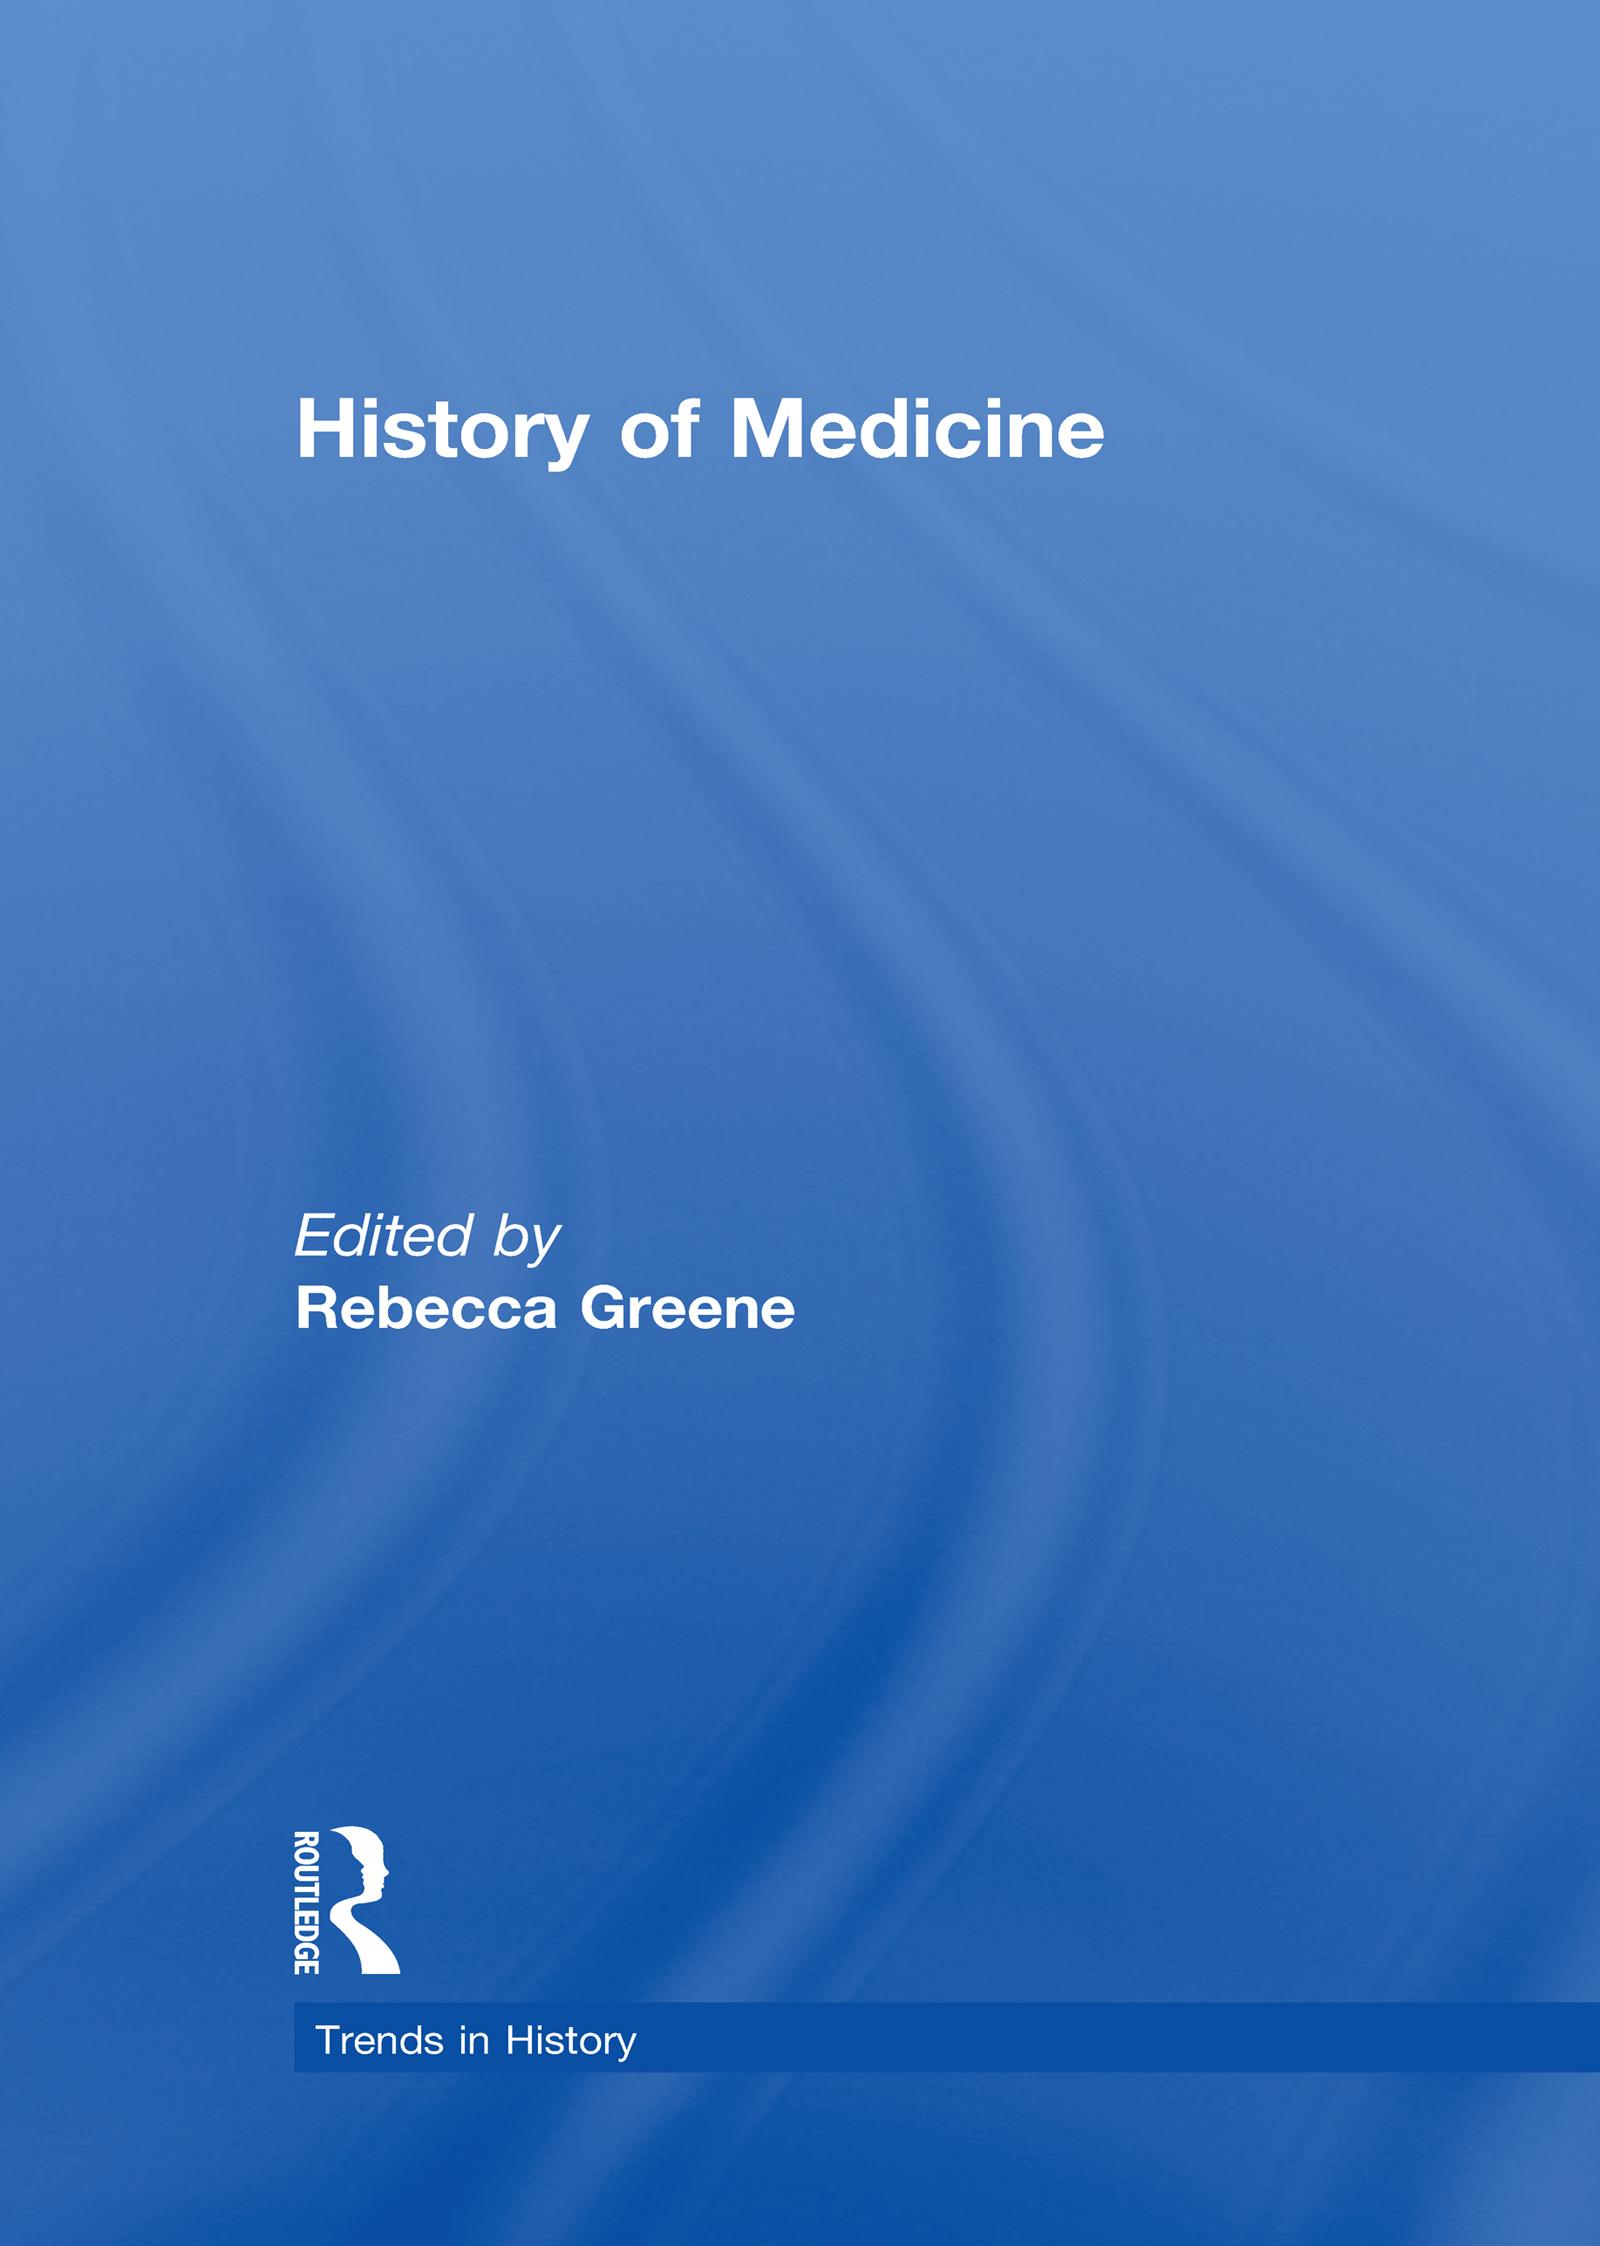 History of Medicine